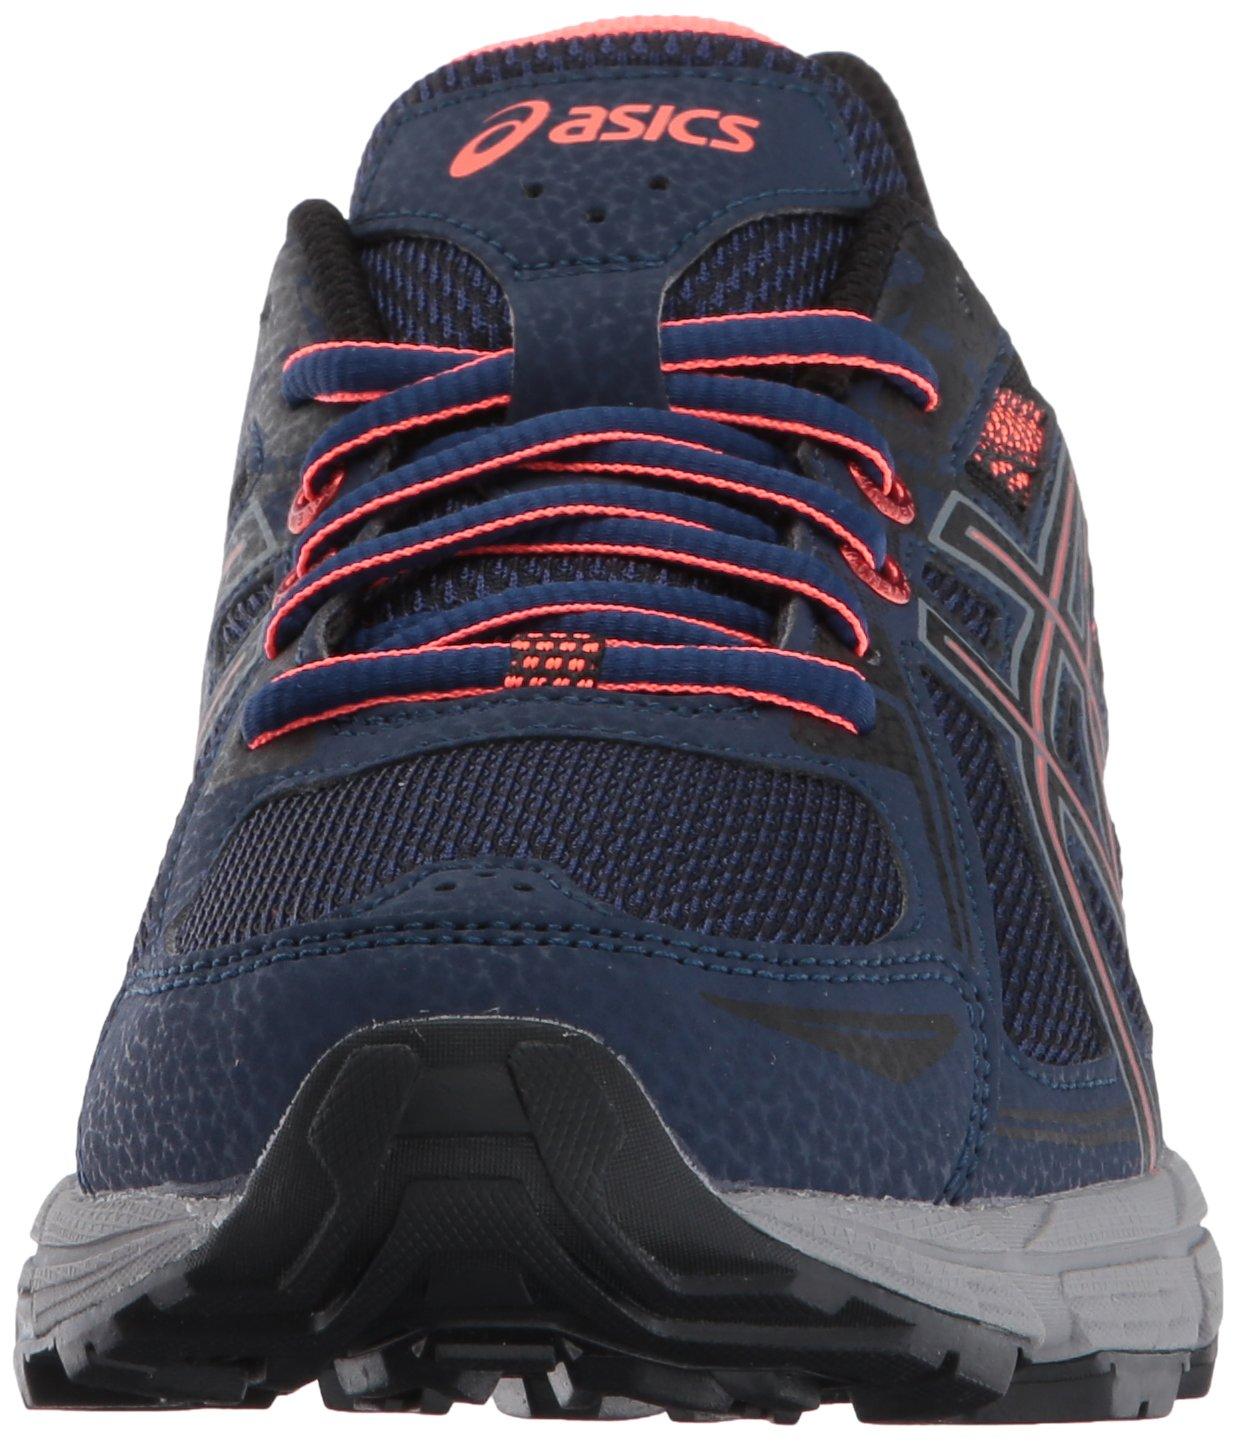 ASICS Women's Gel-Venture 6 Running-Shoes,Indigo Blue/Black/Coral,5 Medium US by ASICS (Image #4)